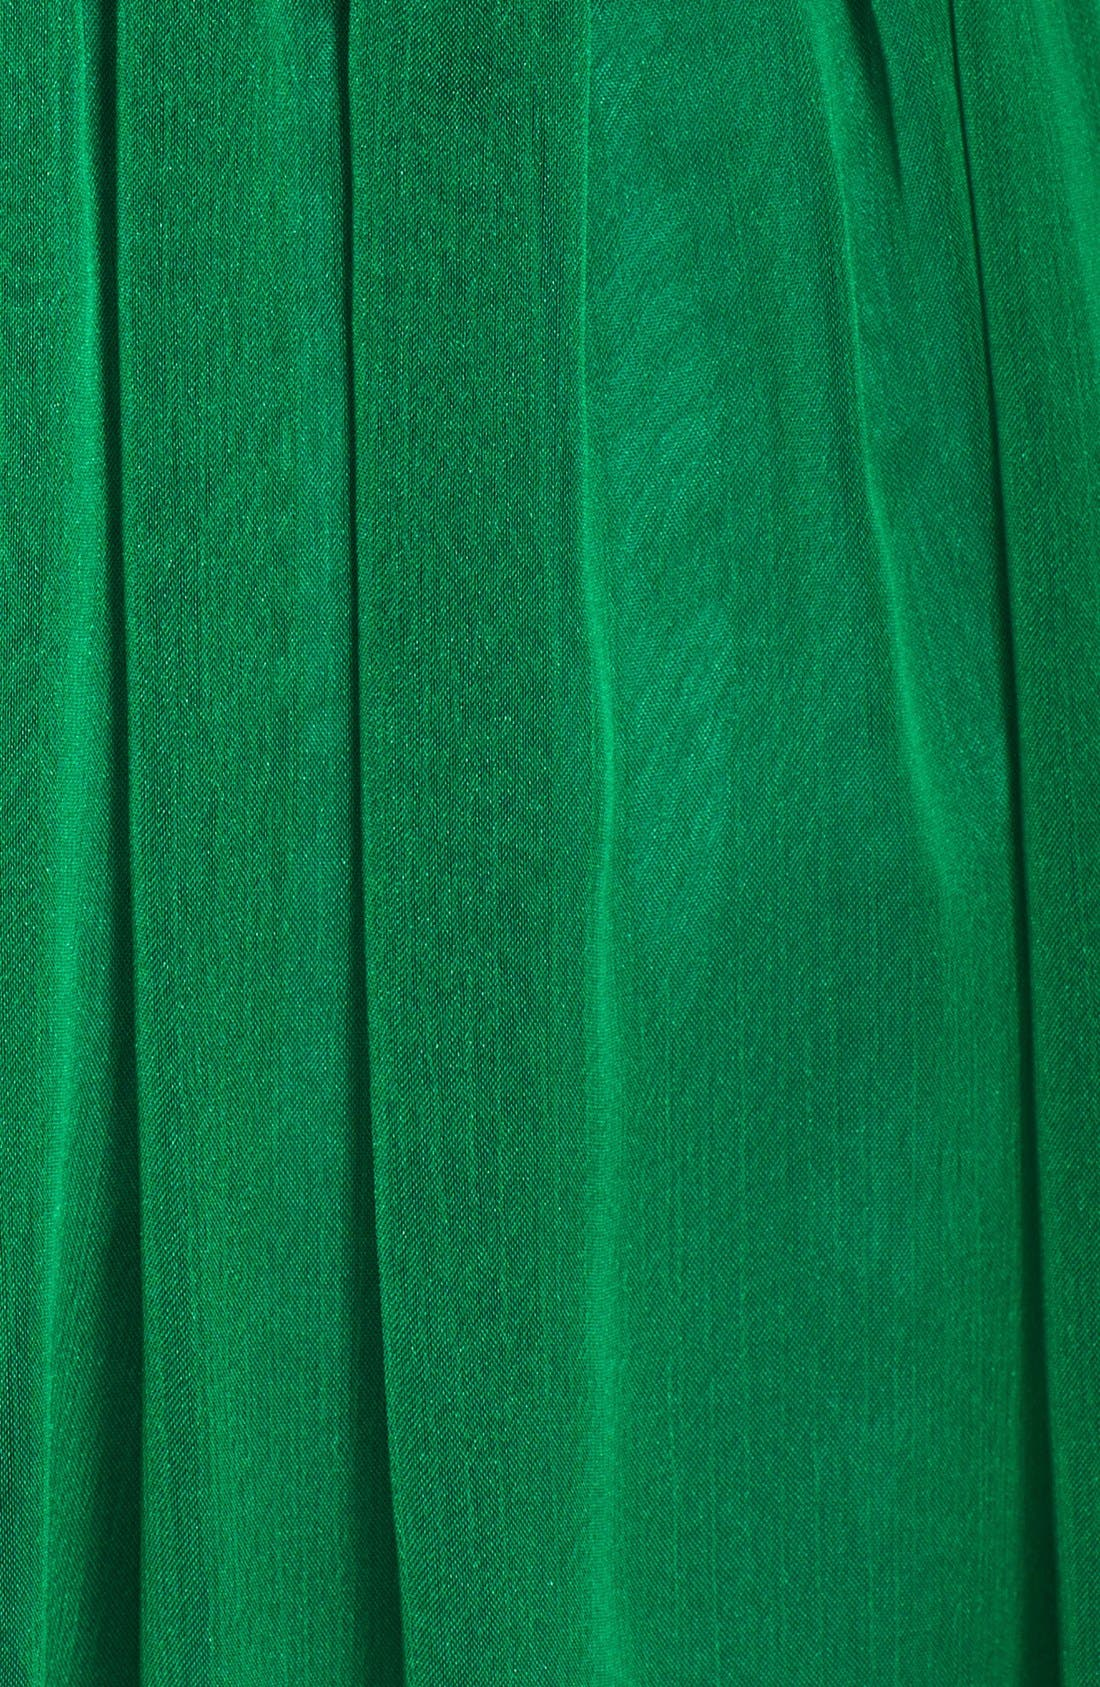 Alternate Image 3  - Monique Lhuillier Bridesmaids Shirred Chiffon Gown